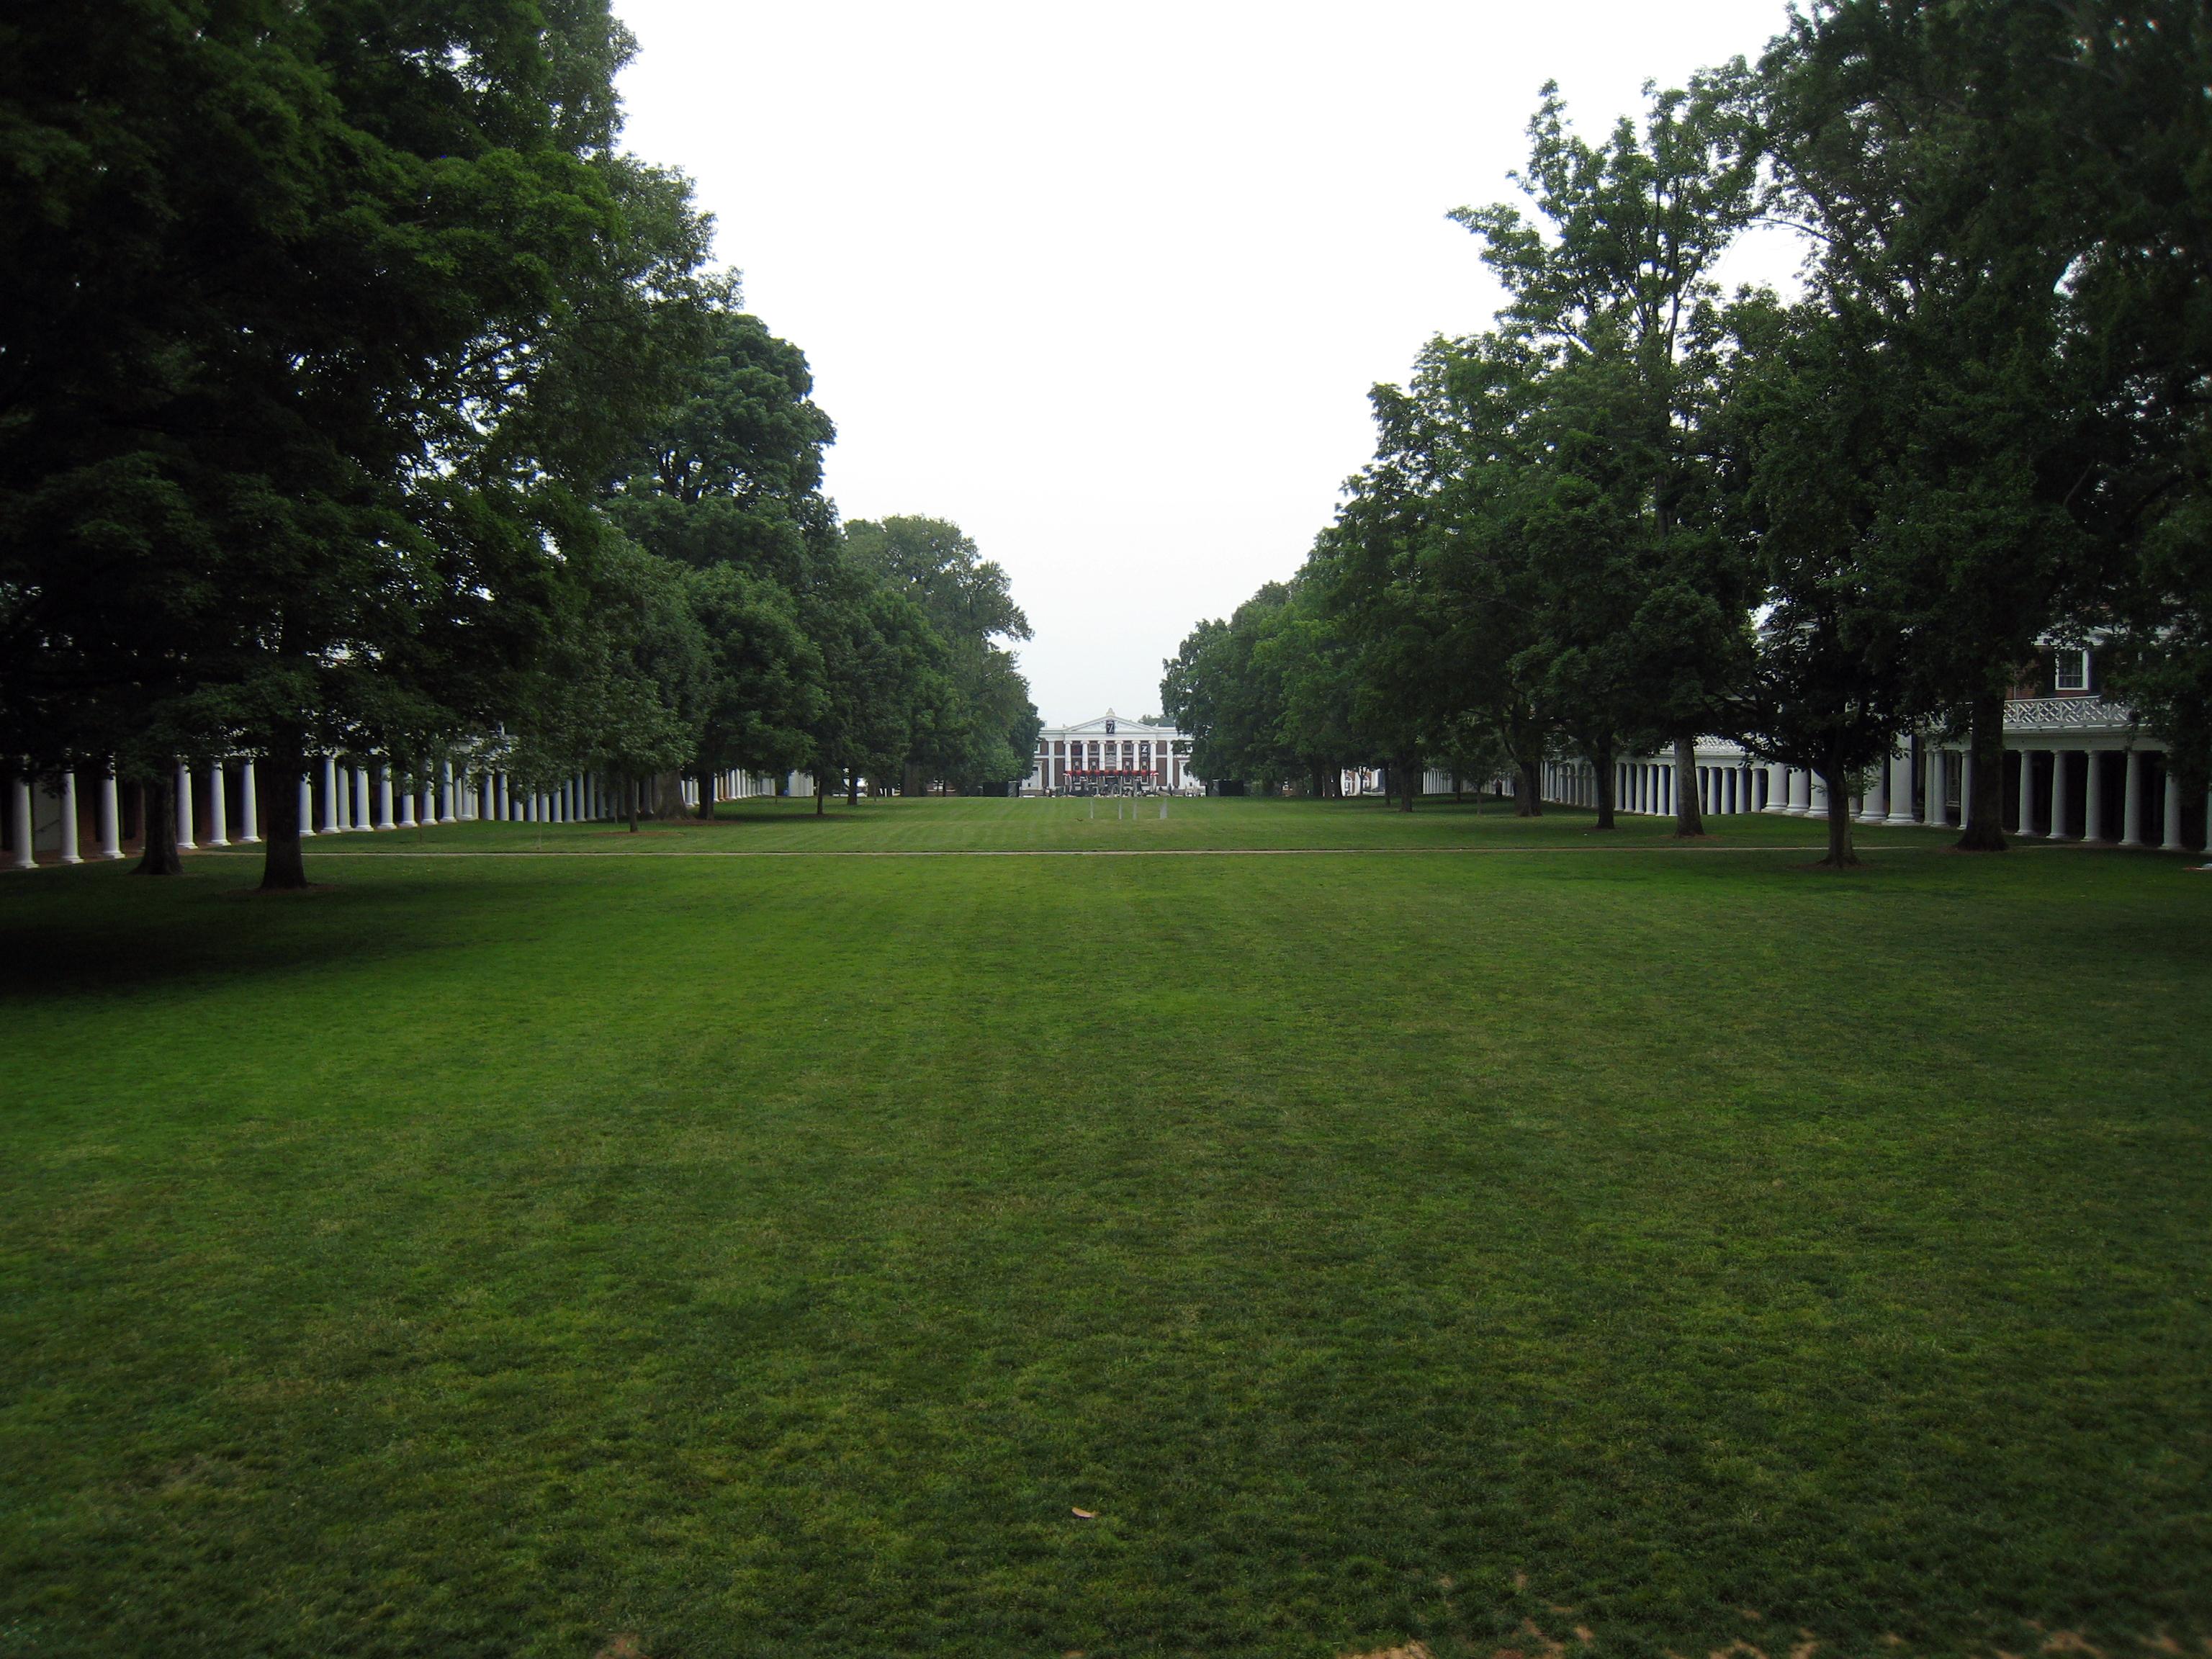 Lawn - Wikipedia